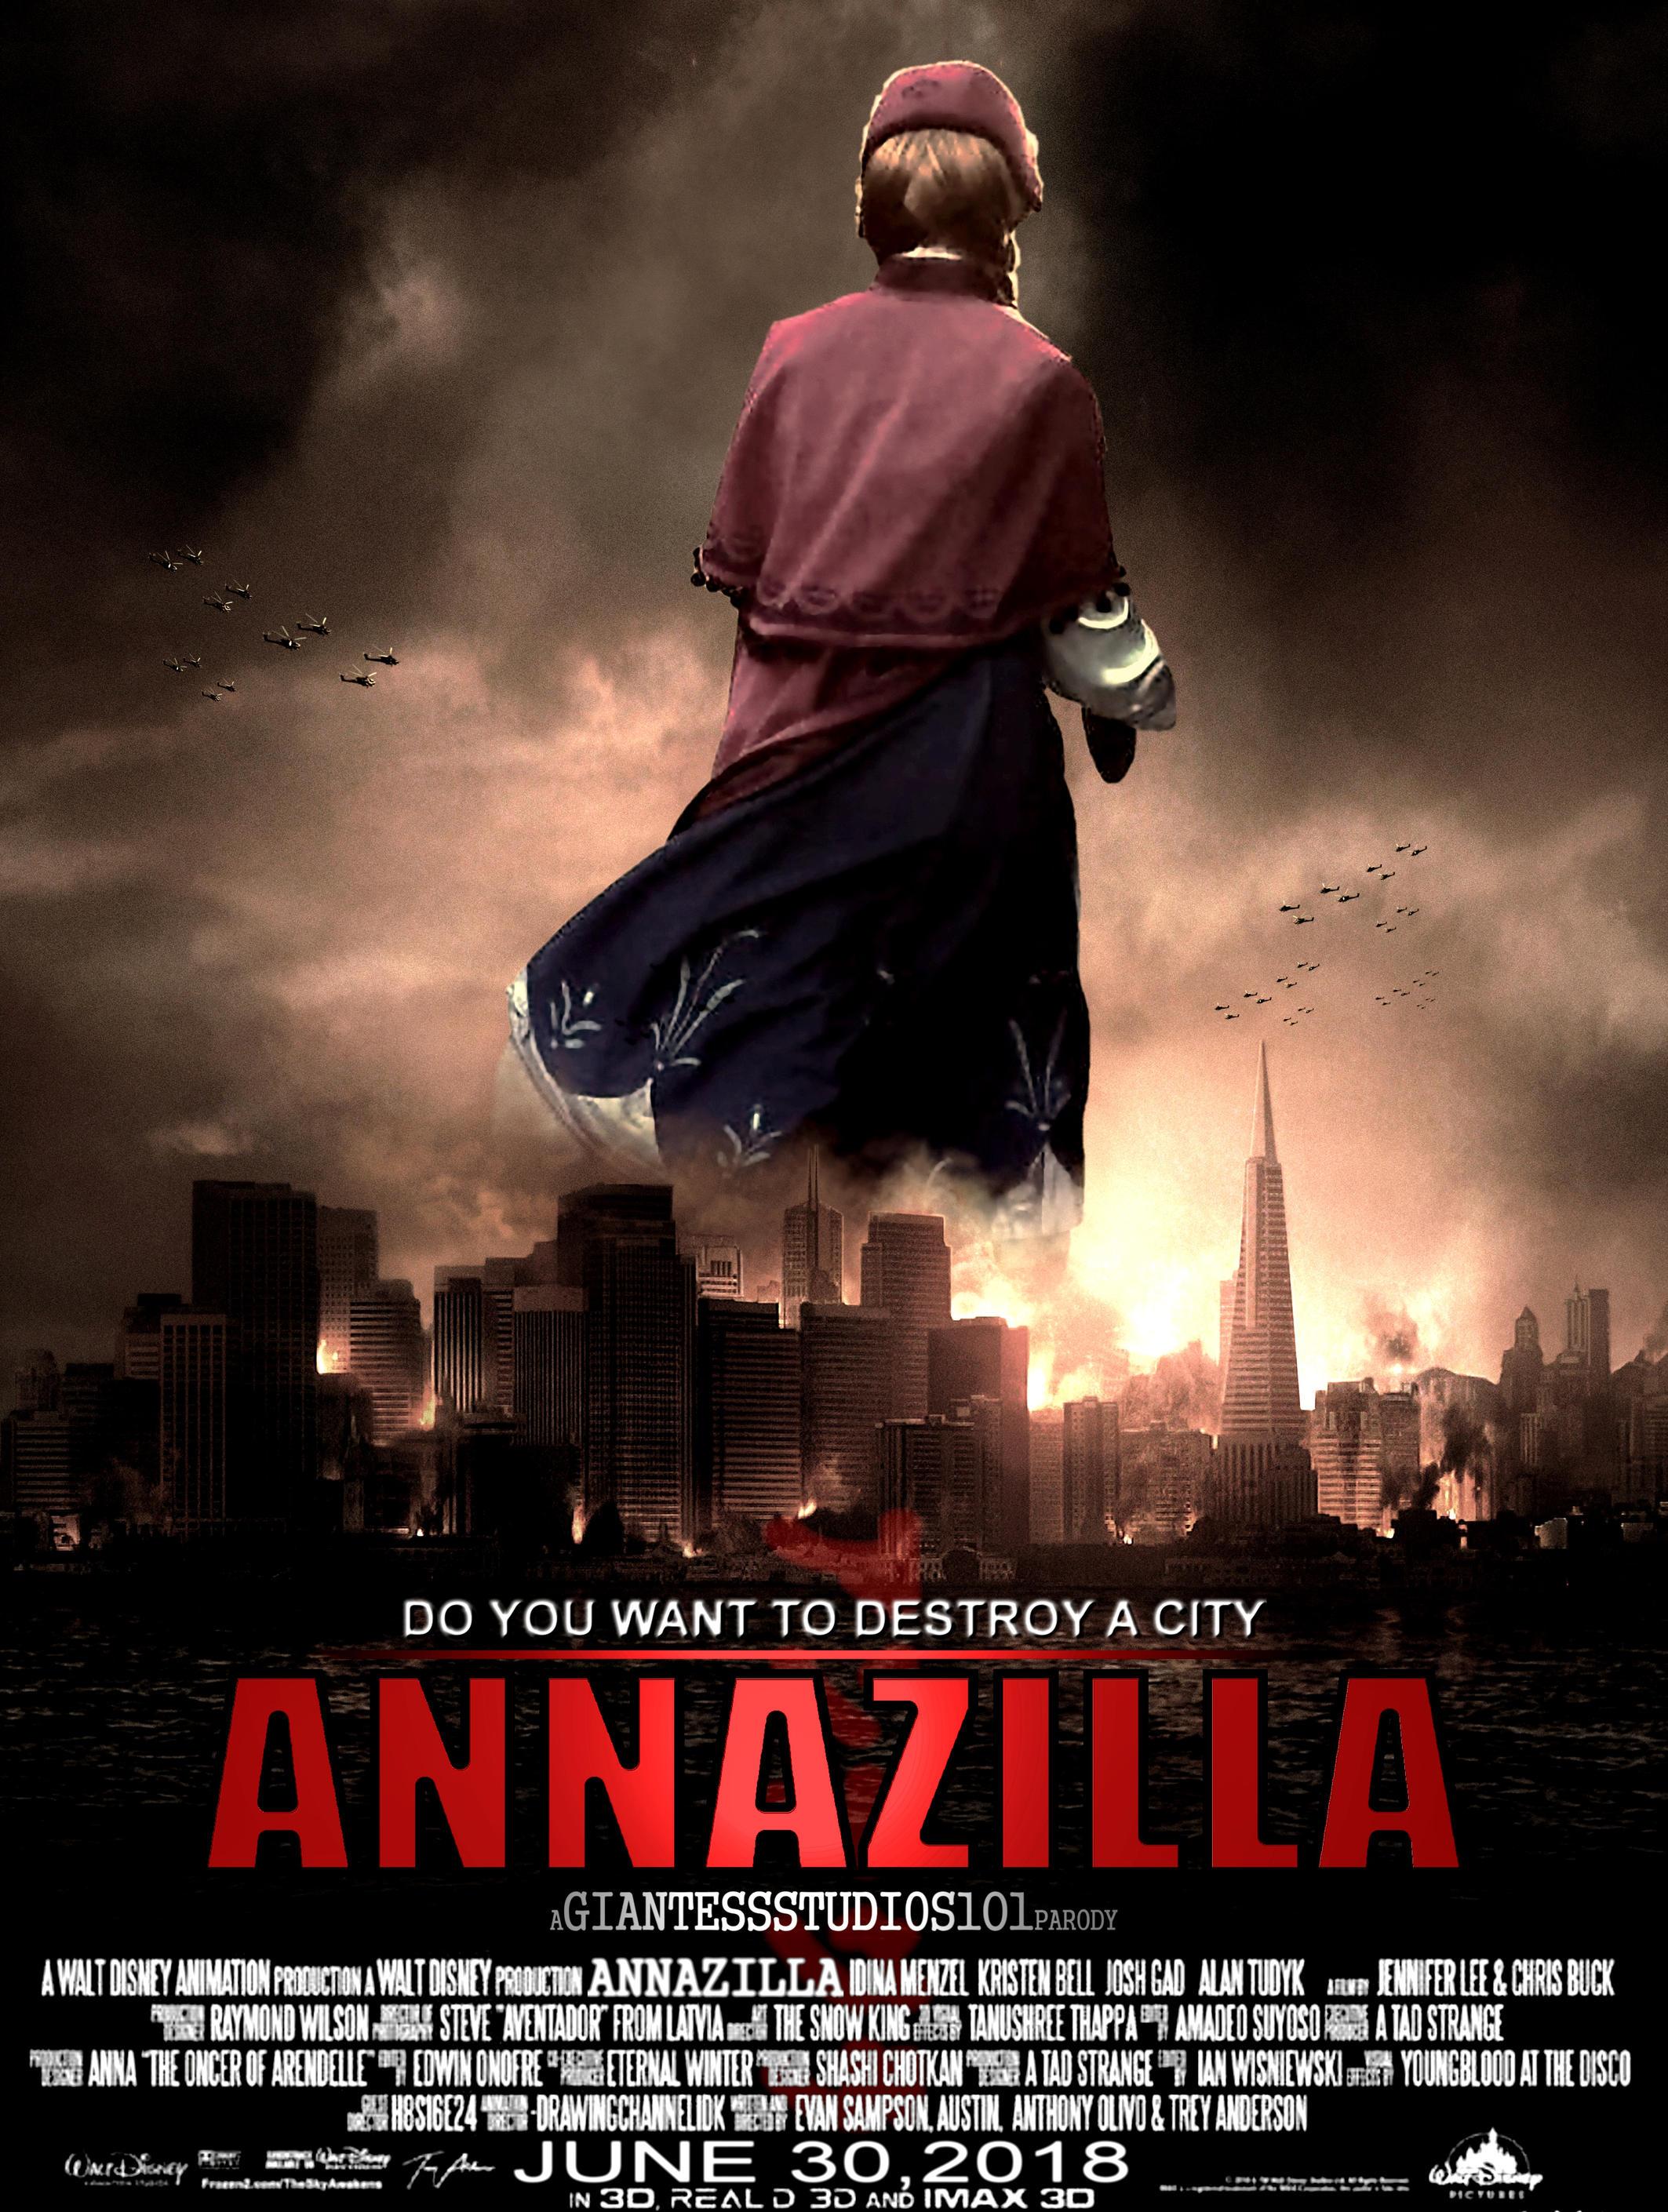 Mega Giantess Princess Annazilla Parody by GiantessStudios101